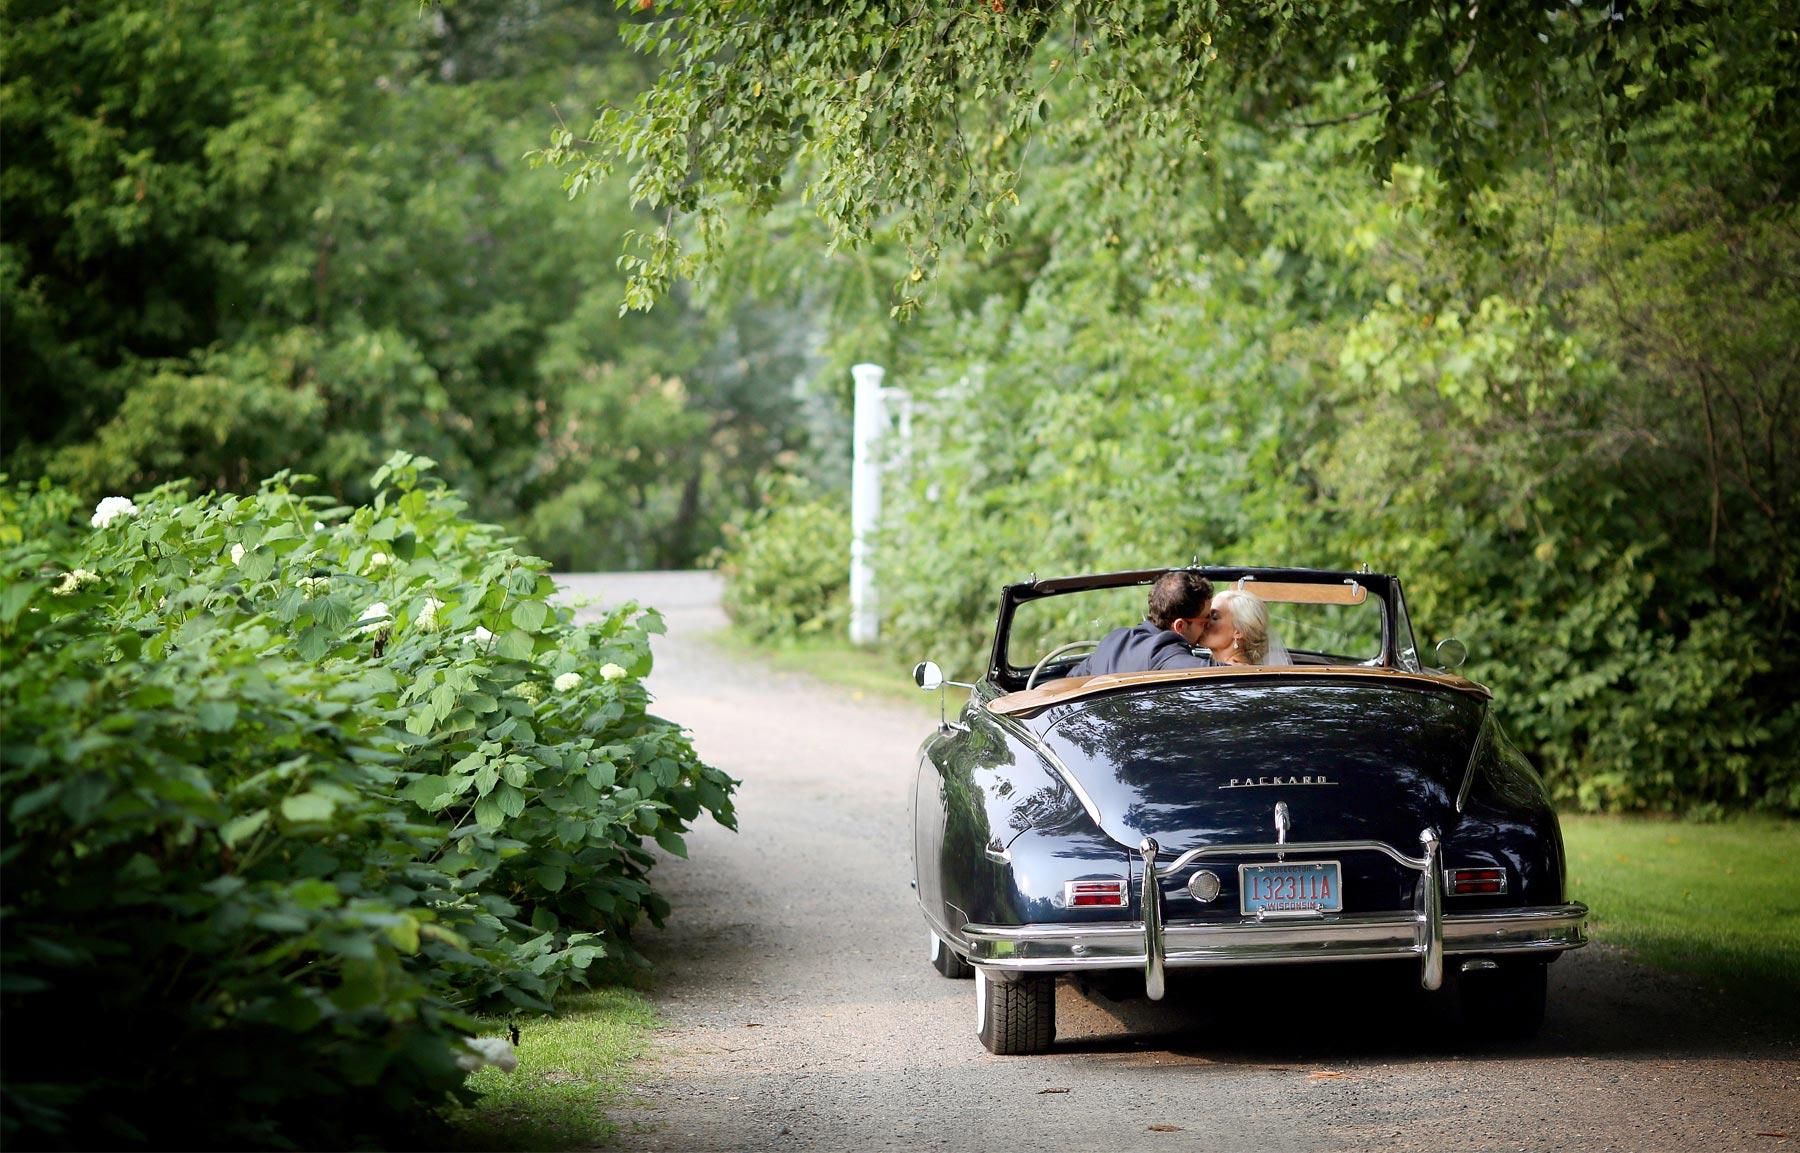 14-Stillwater-Minnesota-Wedding-Photography-by-Vick-Photography-Camrose-Hill-Rustic-Convertable-Woods-Tina-&-Eric.jpg